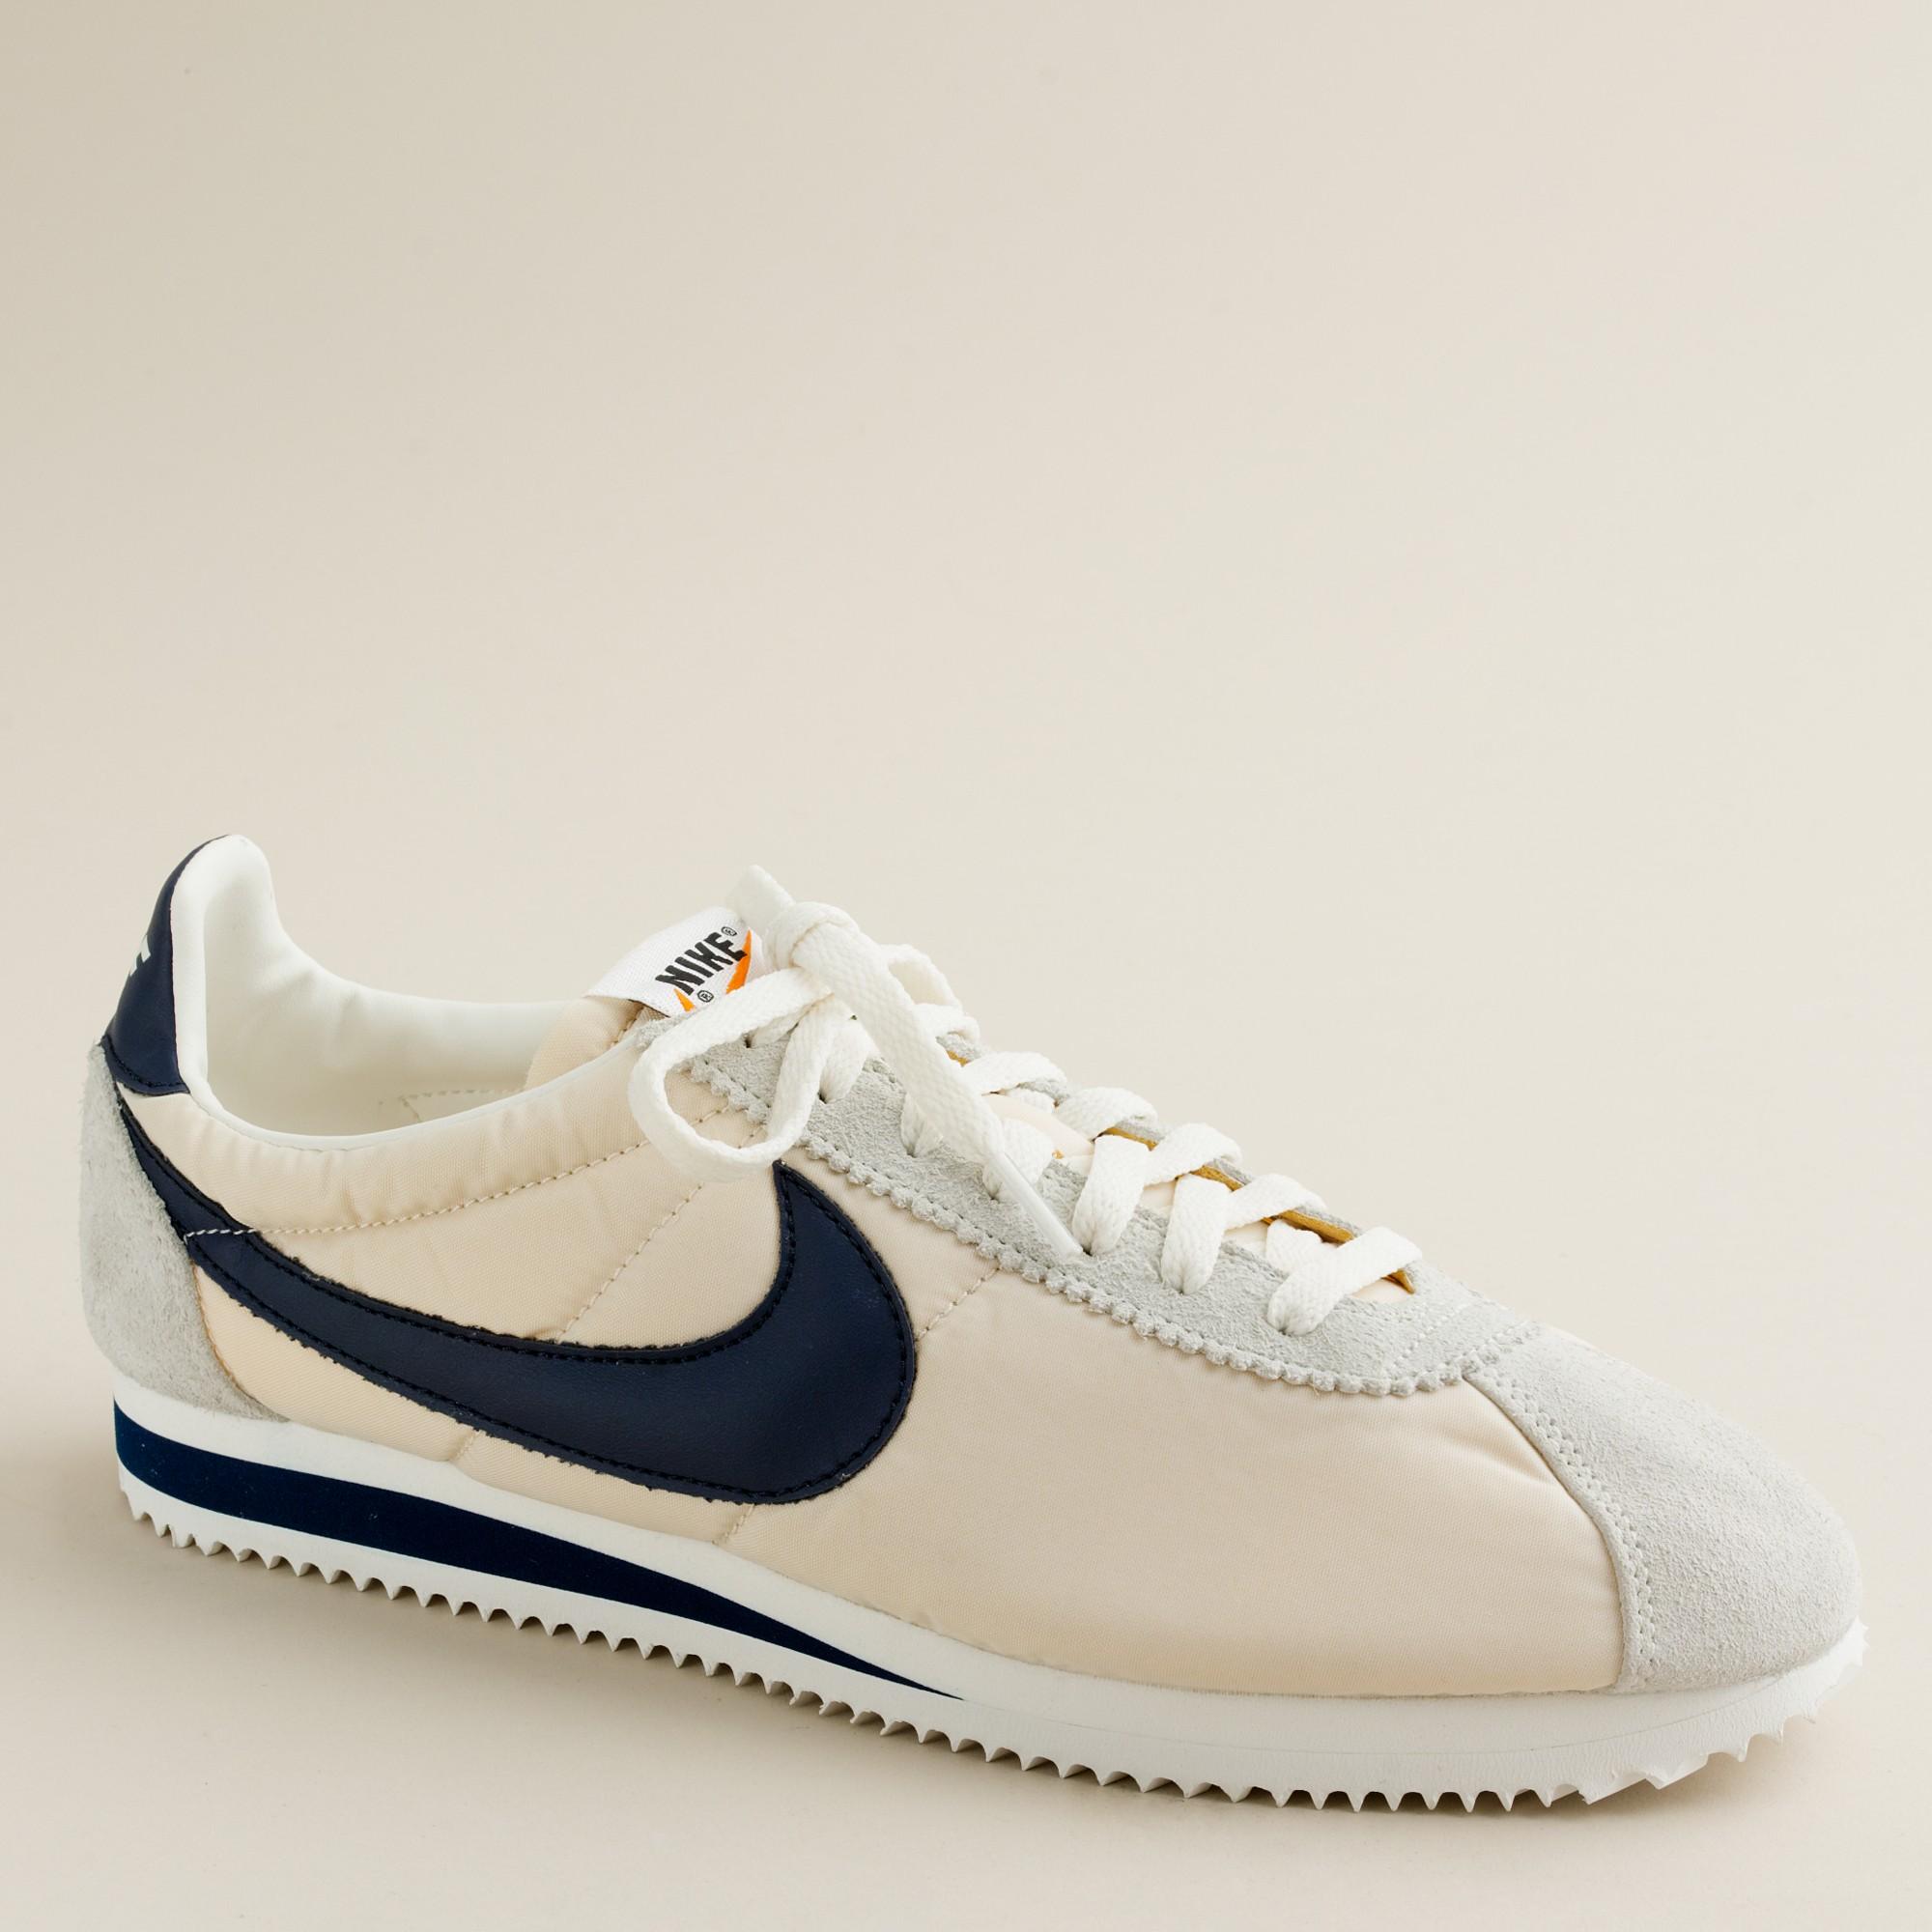 online store 78fe0 5caf2 Nike Cortez Vintage White smithland.co.uk